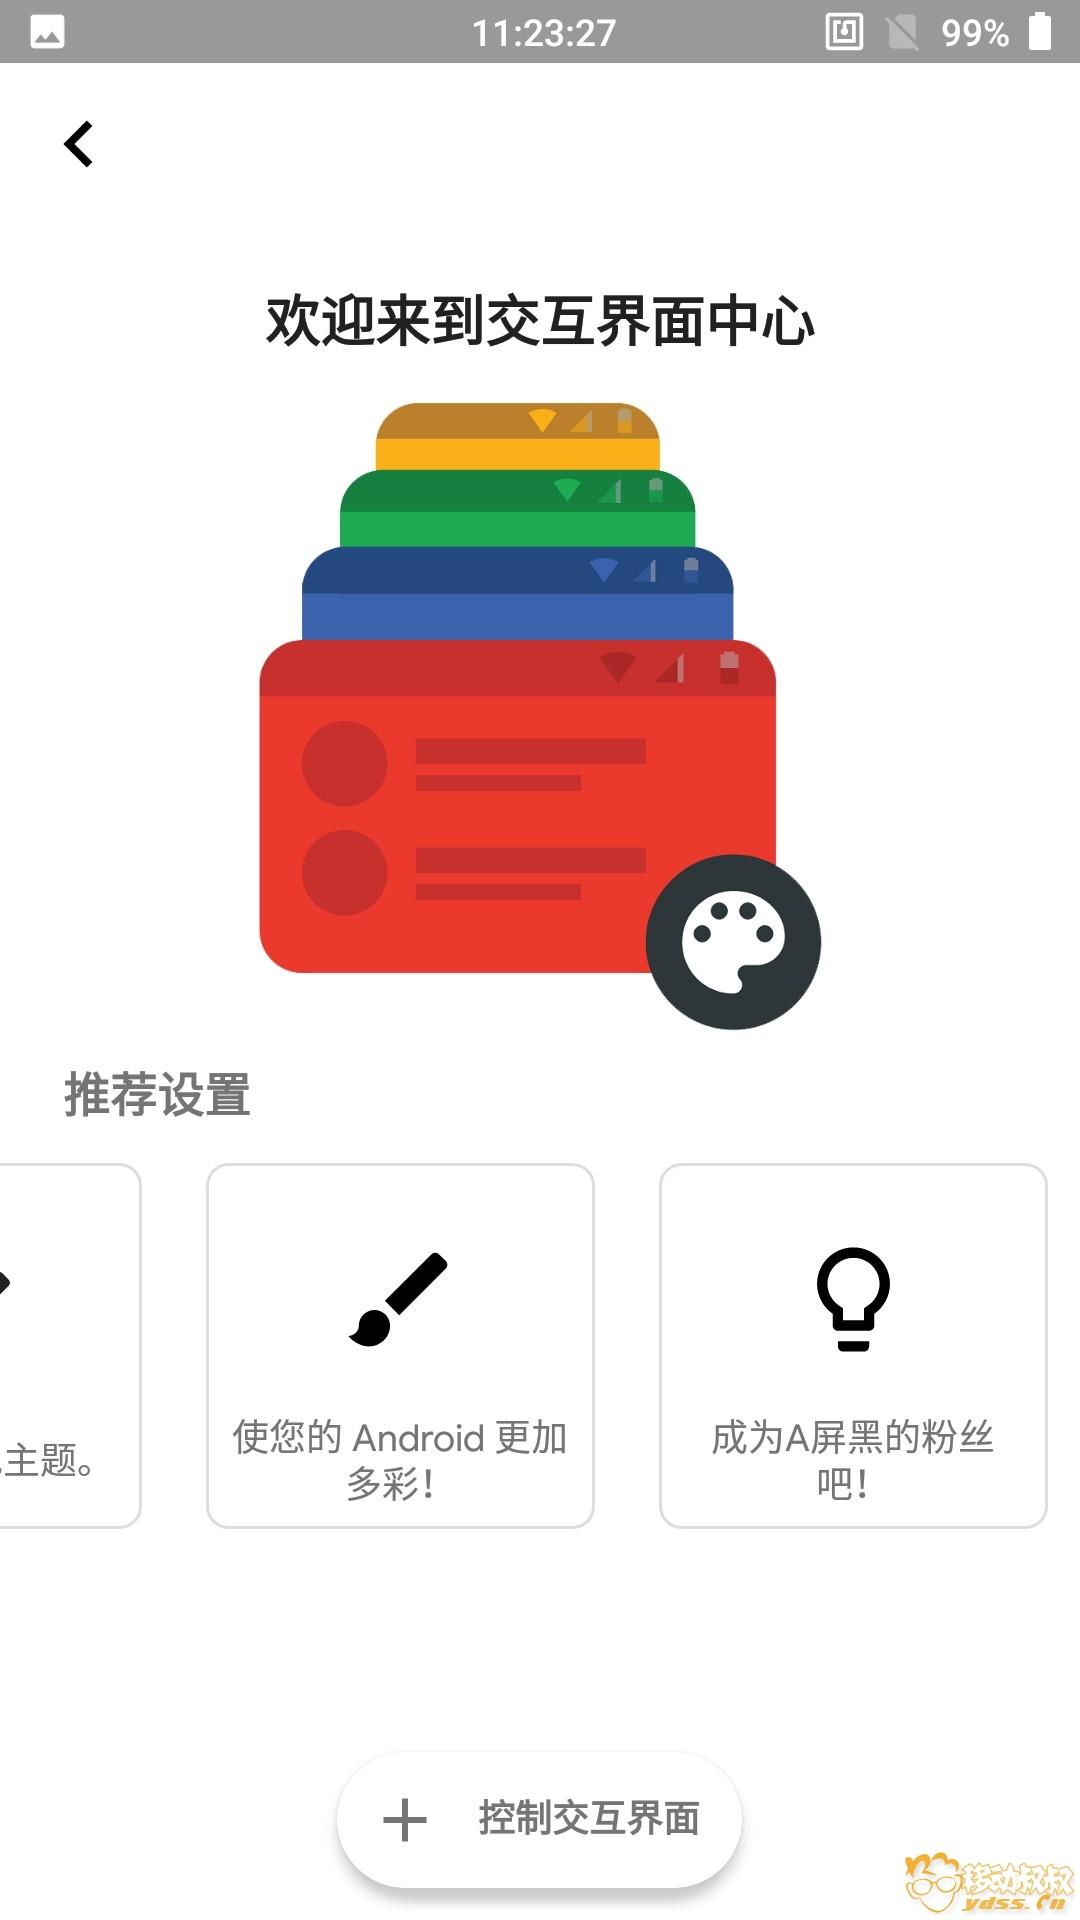 New0093Screenshot___20180920-112330.jpg